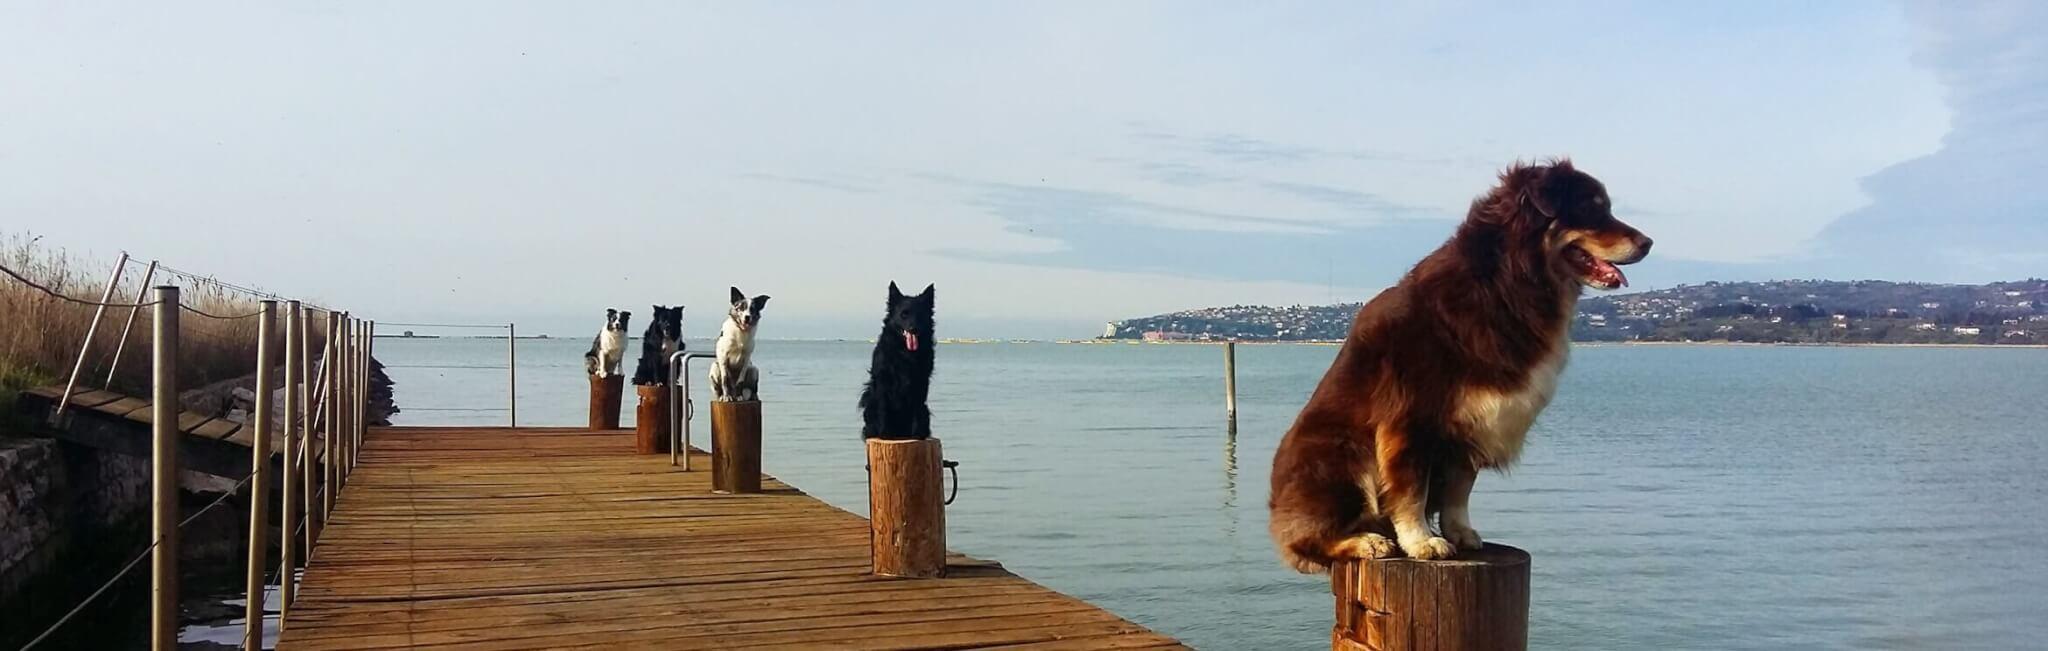 Vzgojeni psi na pomolu